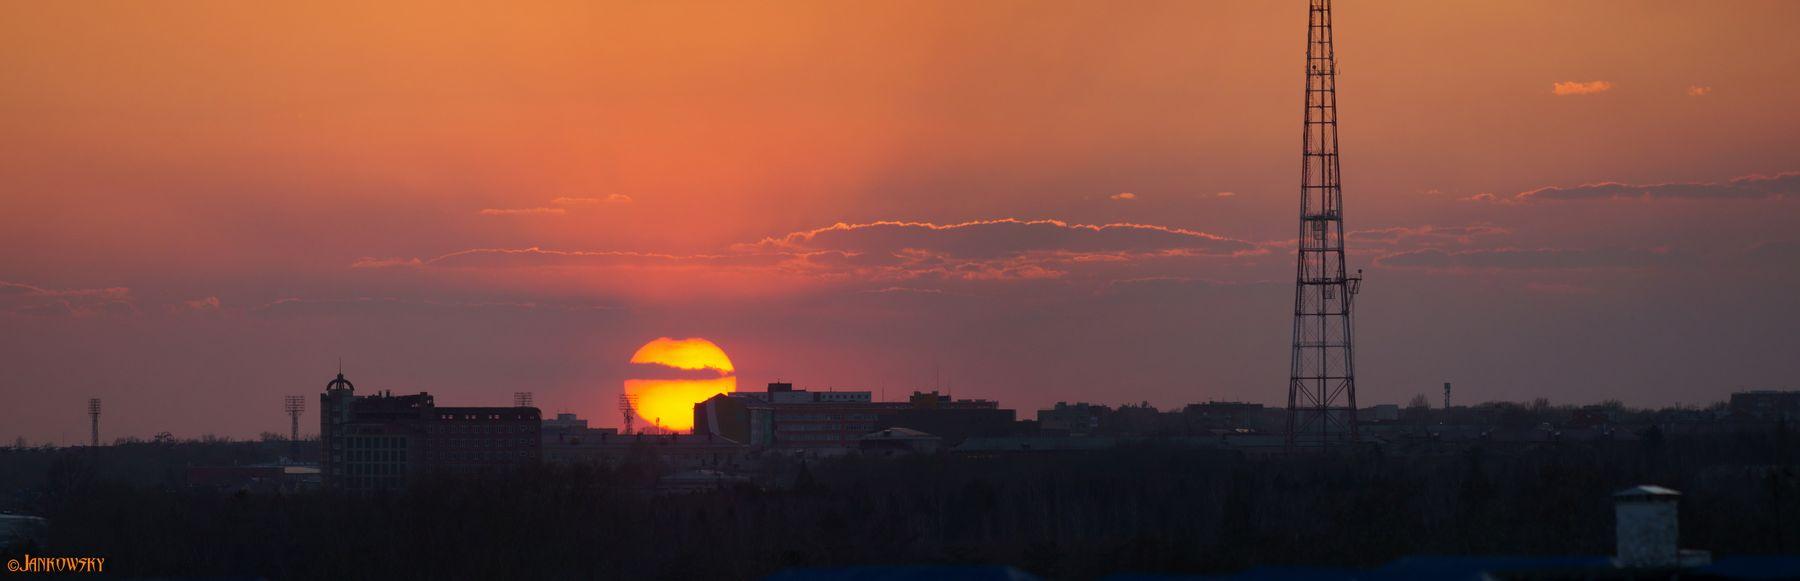 Пекло  26.04.21 омск панорама закат пекло солнце canon fd 300mm f2.8l